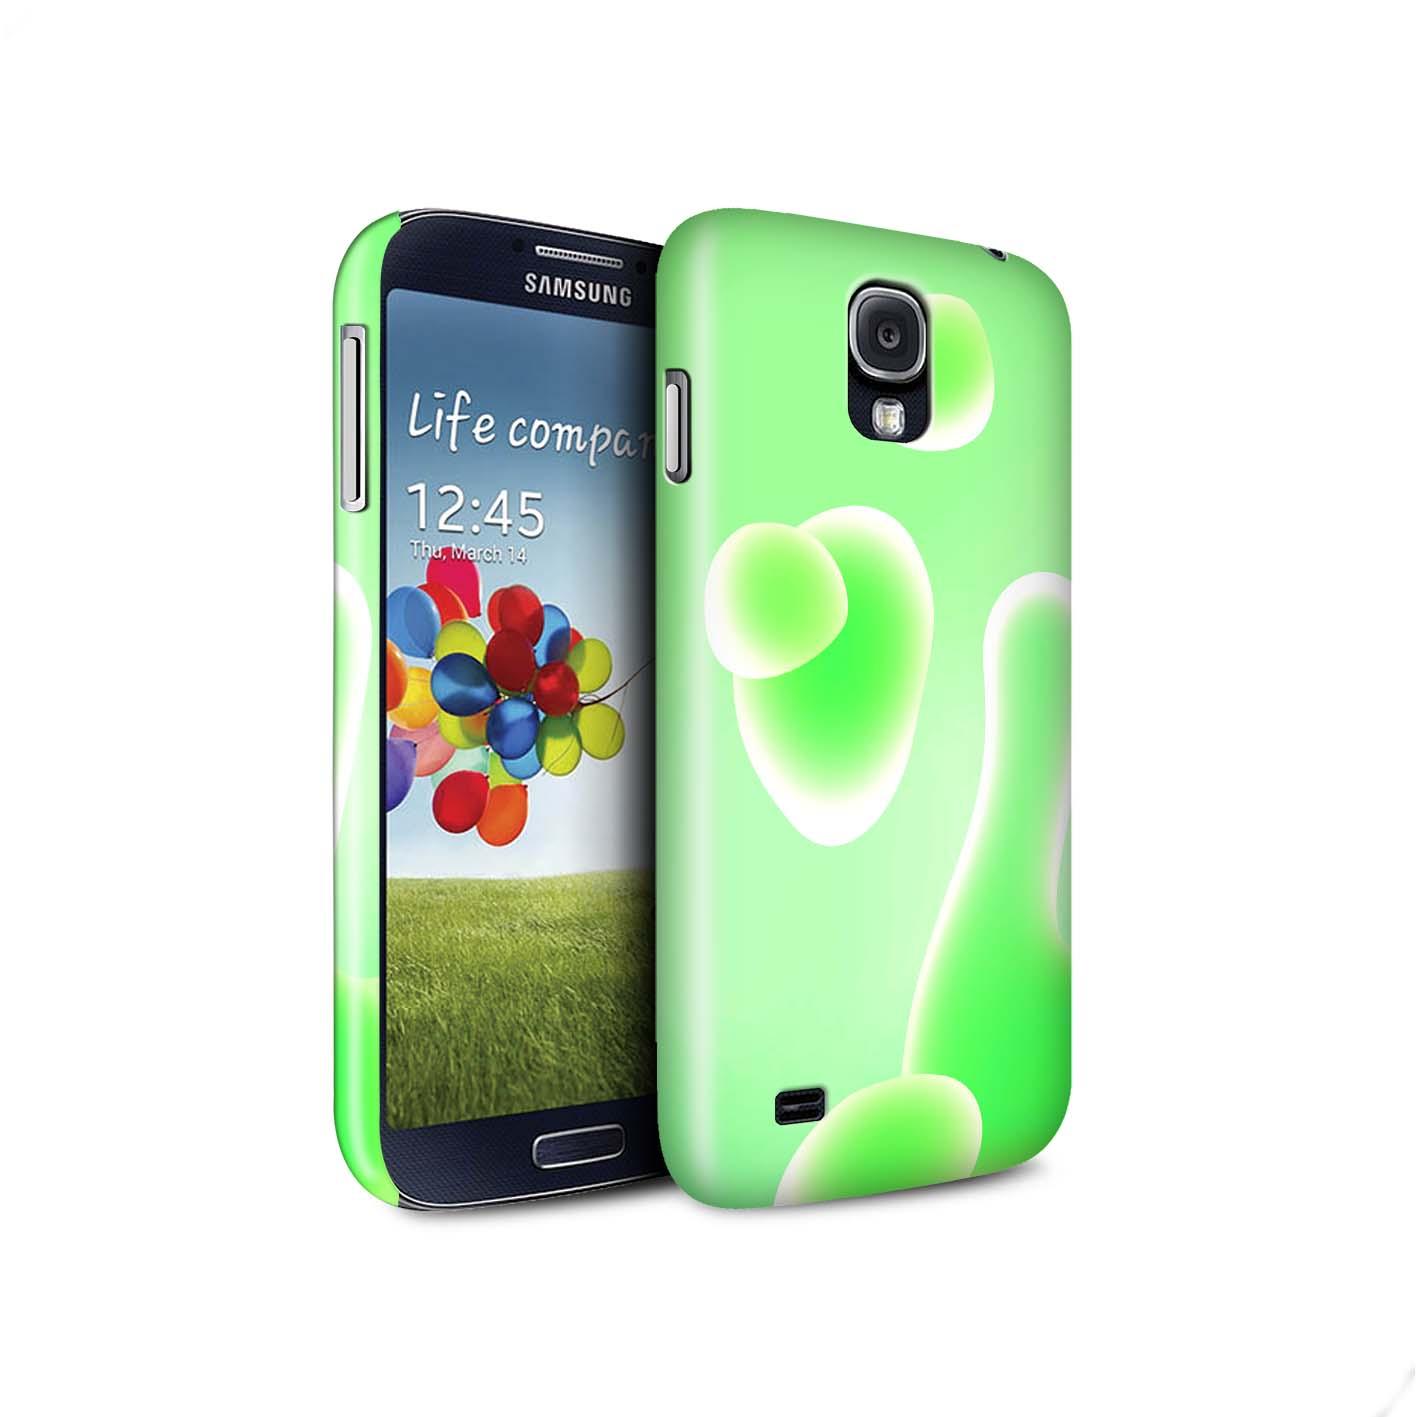 STUFF4-Matte-Phone-Case-for-Samsung-Galaxy-S4-SIV-Lava-Lamp